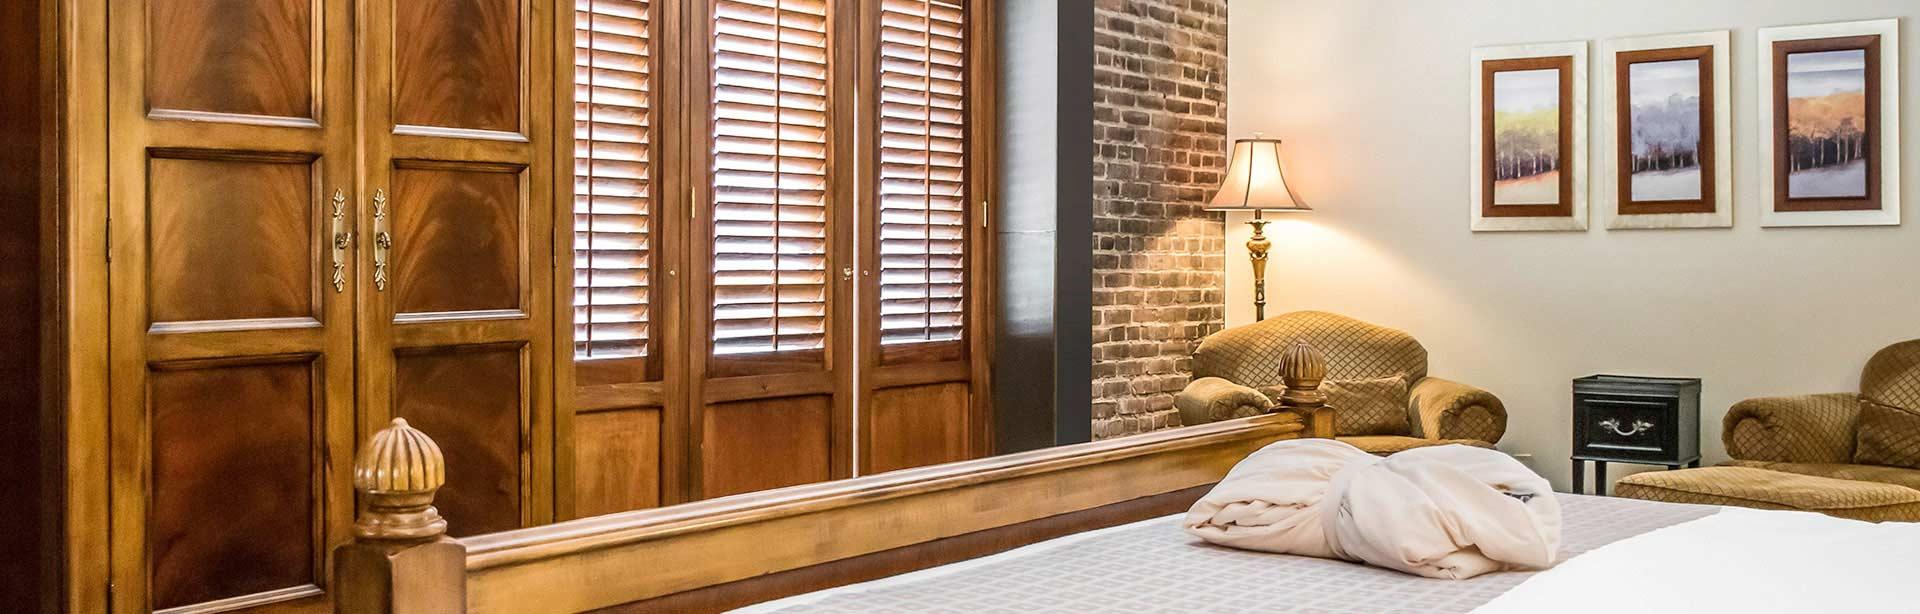 King Bed Harbor View Room at Inn at Henderson's Wharf Baltimore Maryland